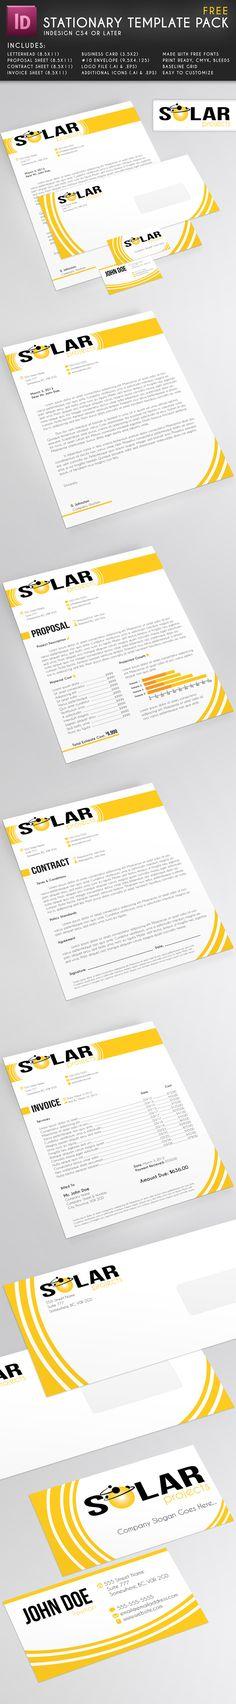 Booklet template, Indesign CS4\/CS5, free download A4 page - booklet template free download